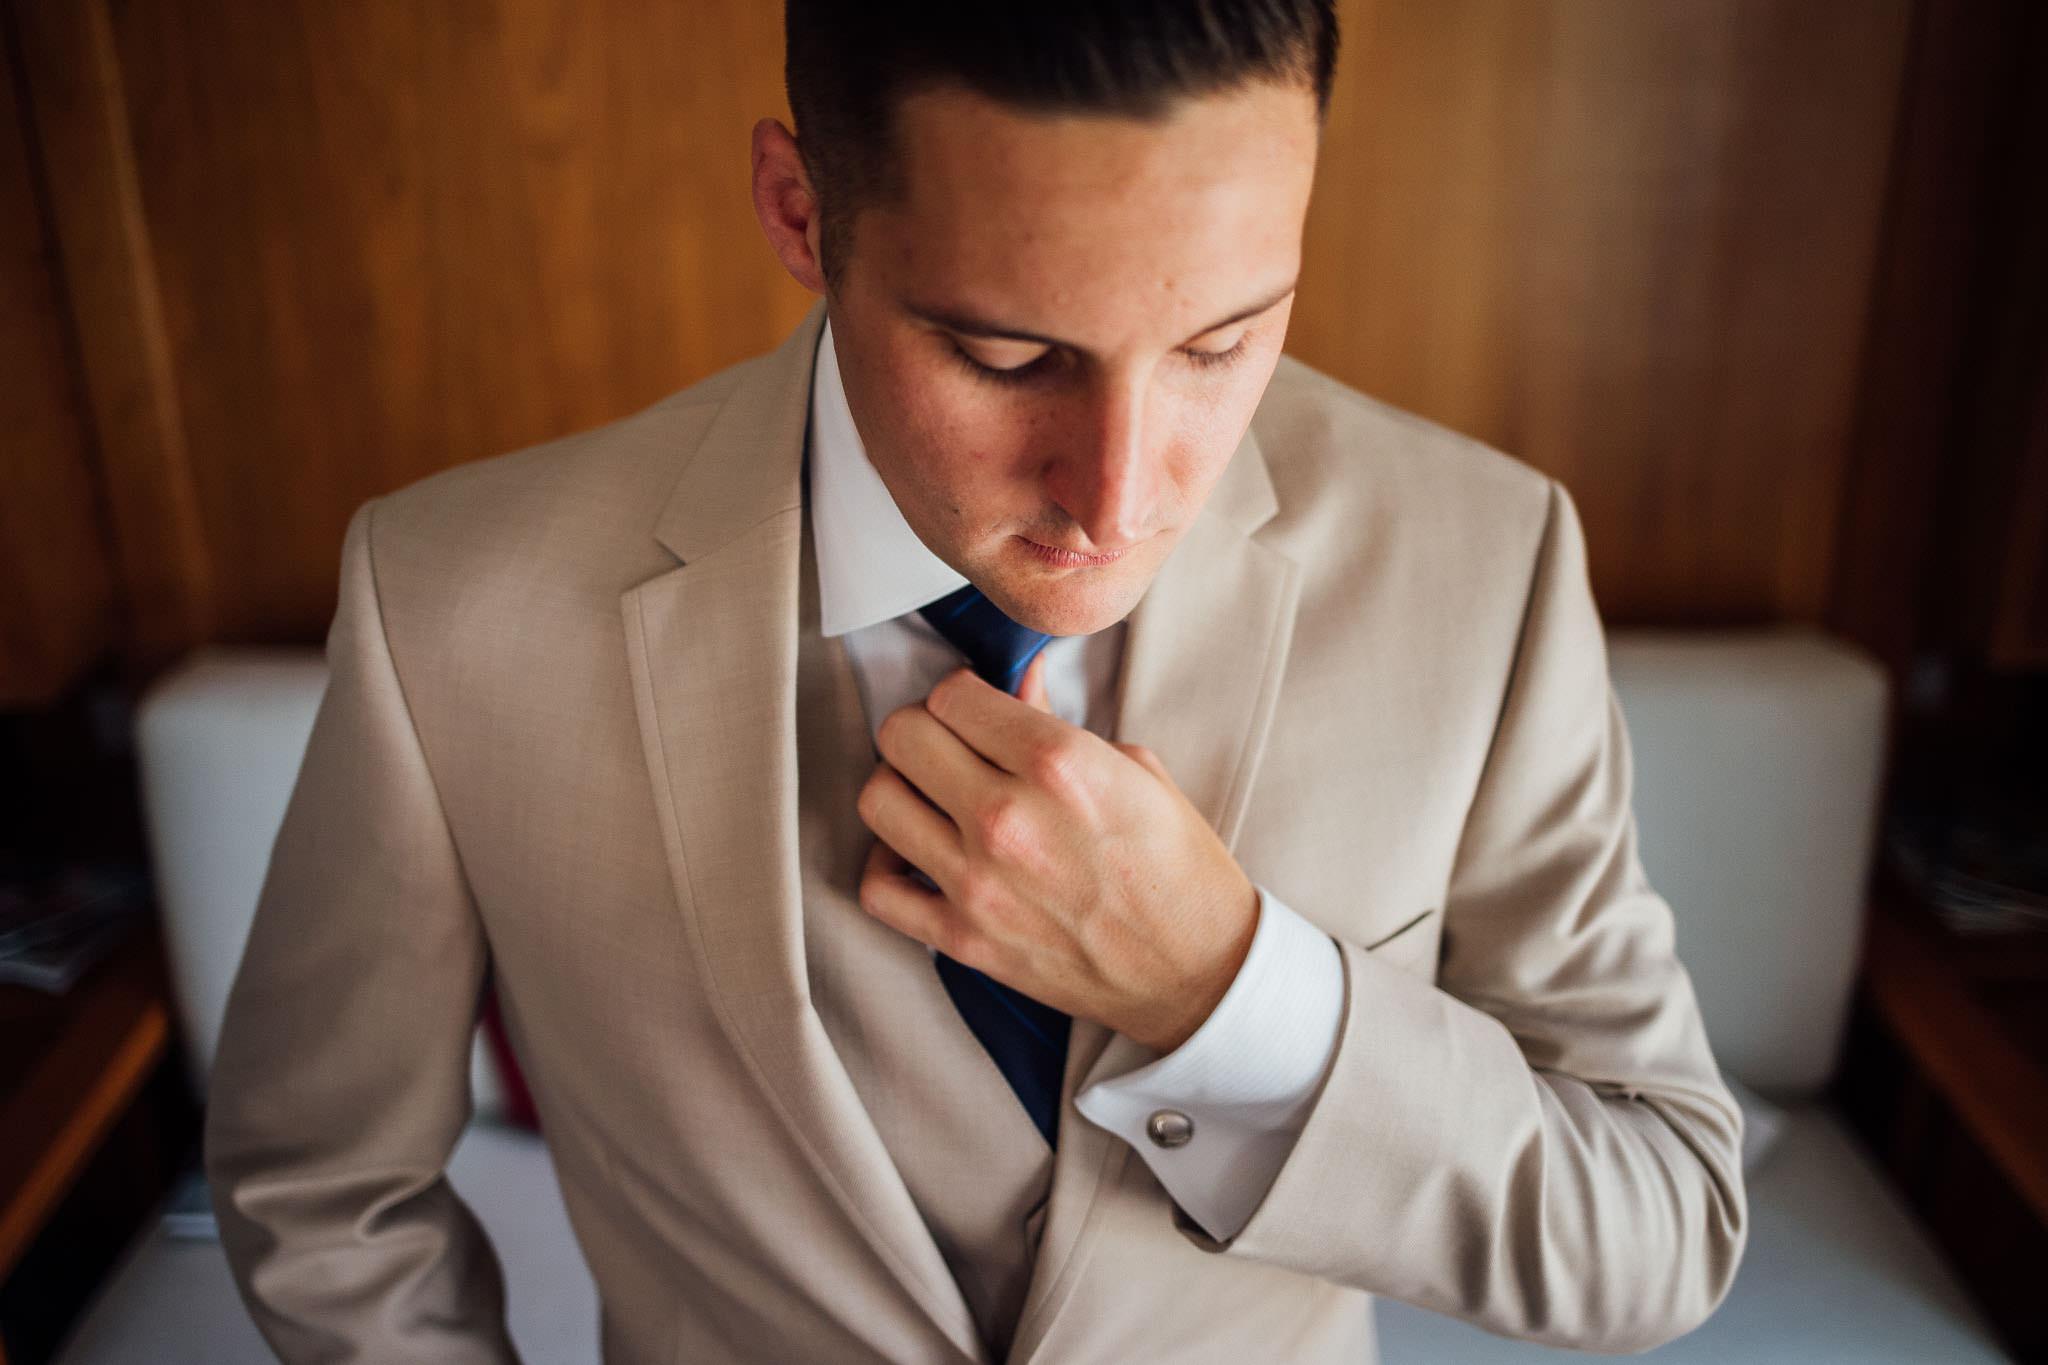 Close up portrait of groom in tux adjusting tie in Waco, Texas